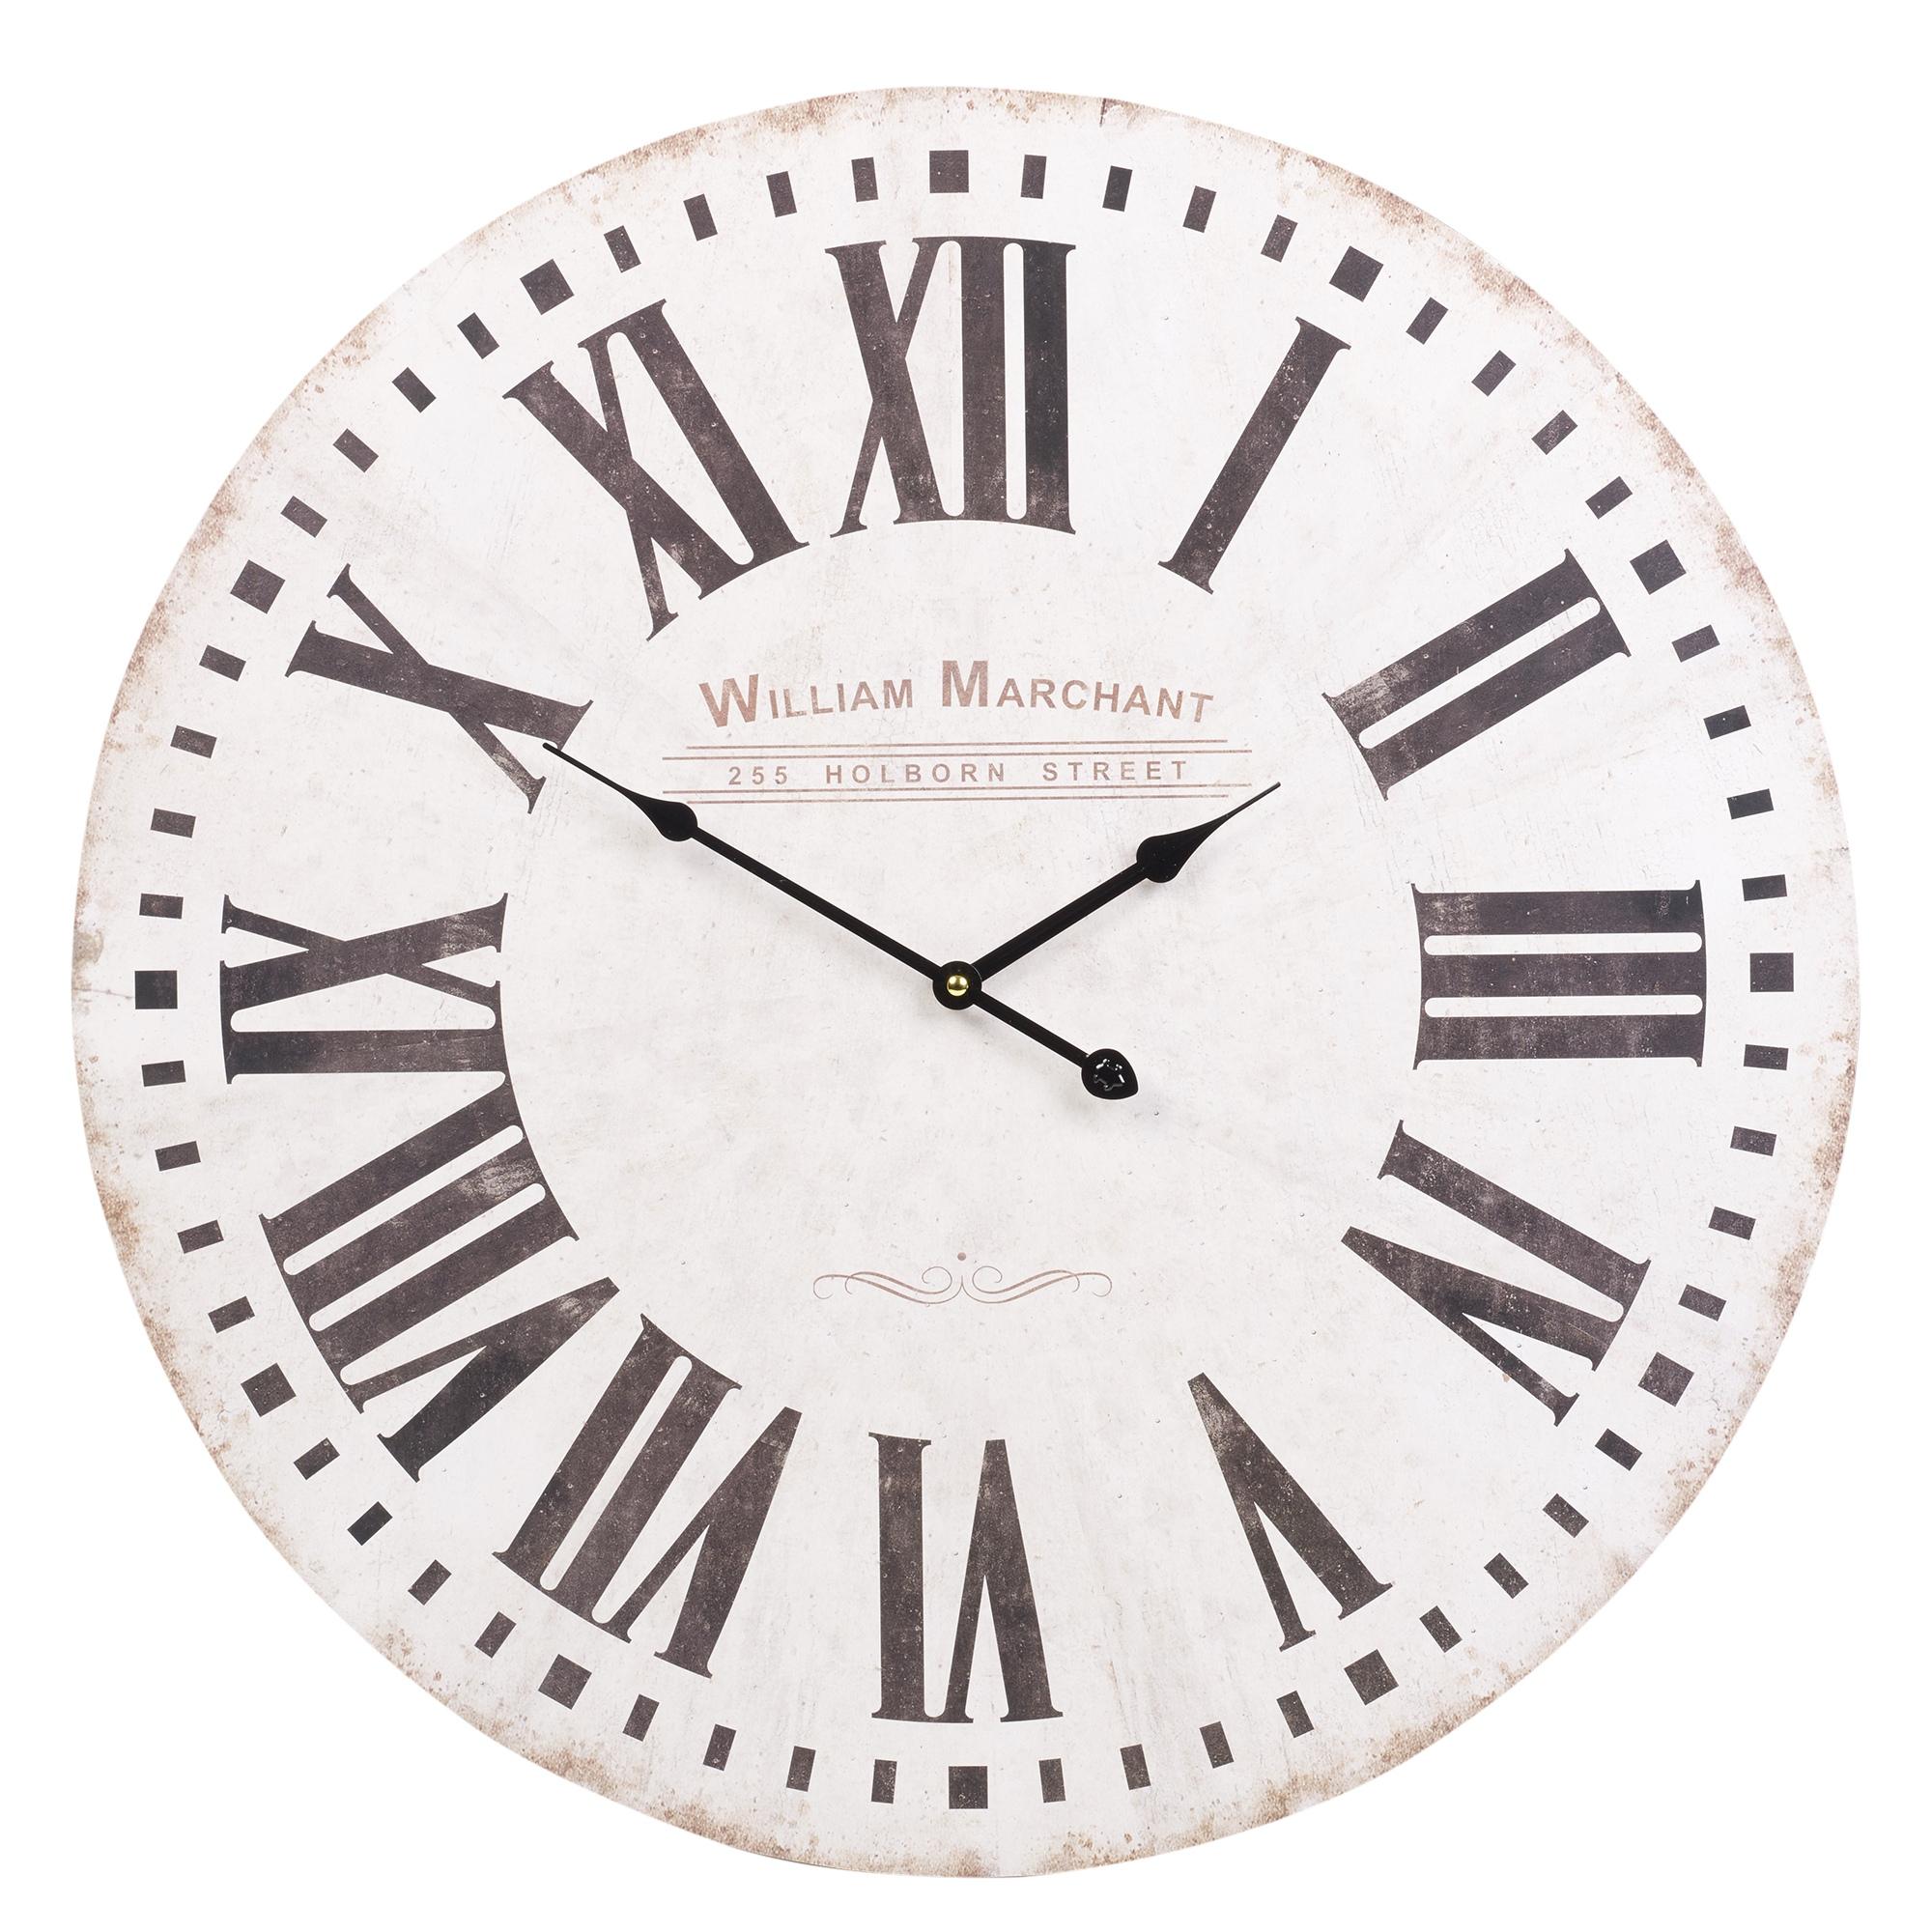 60cm extra grande redondo reloj de pared madera vintage